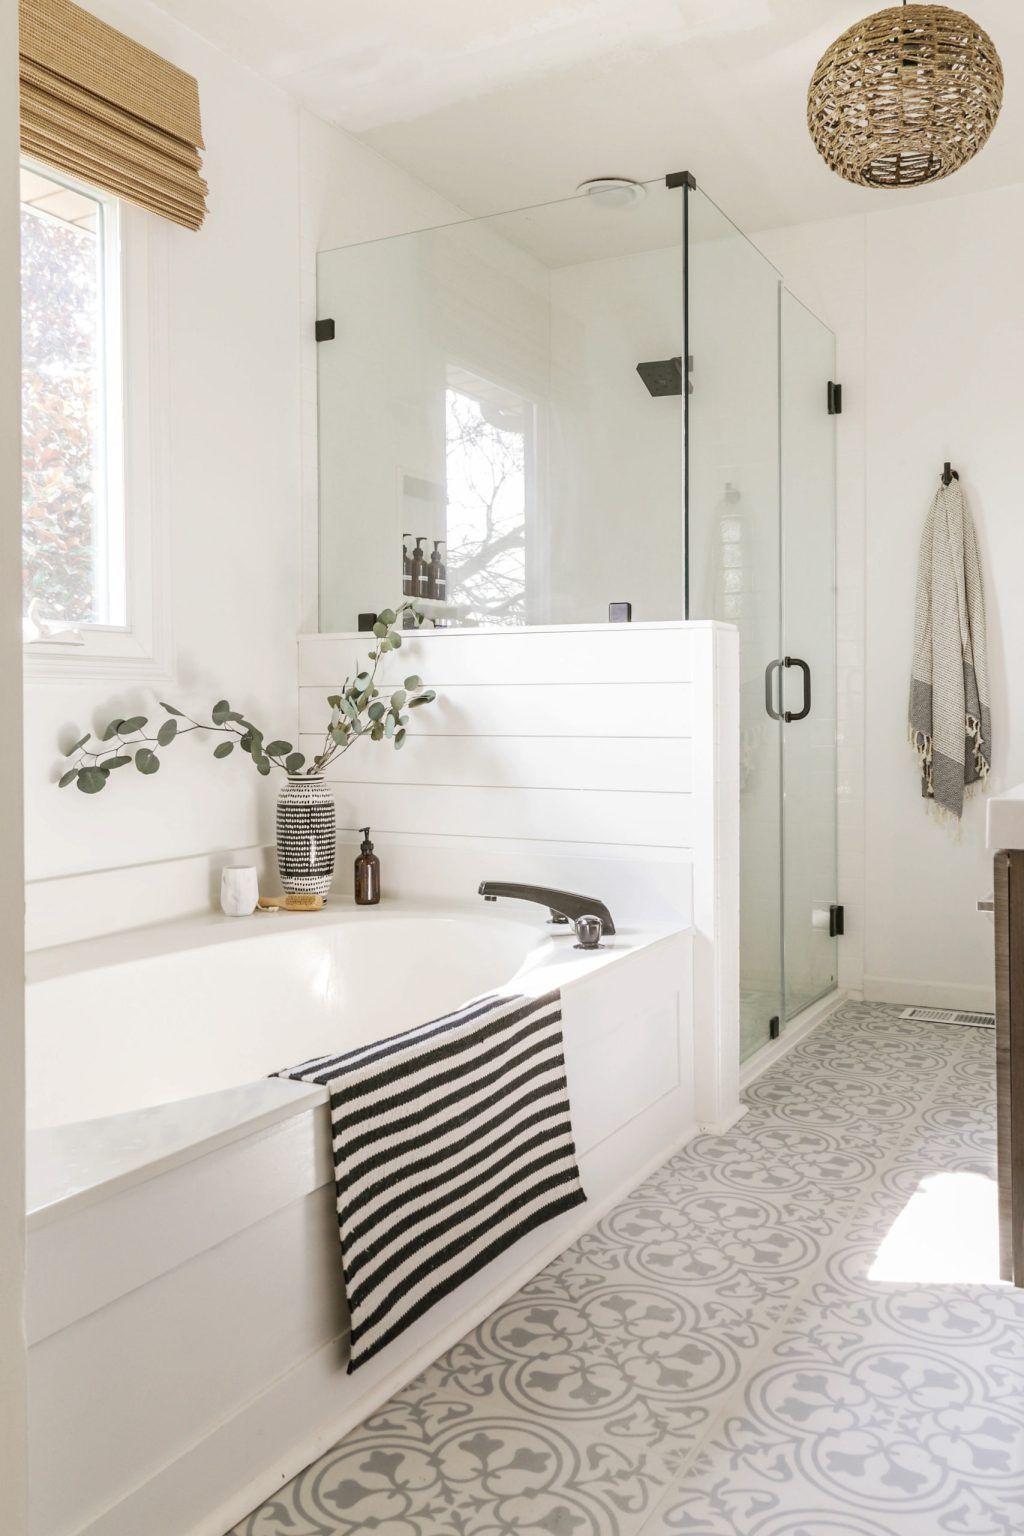 Reveal: Boho Farmhouse Master Bathroom Remodel with Decor Sources